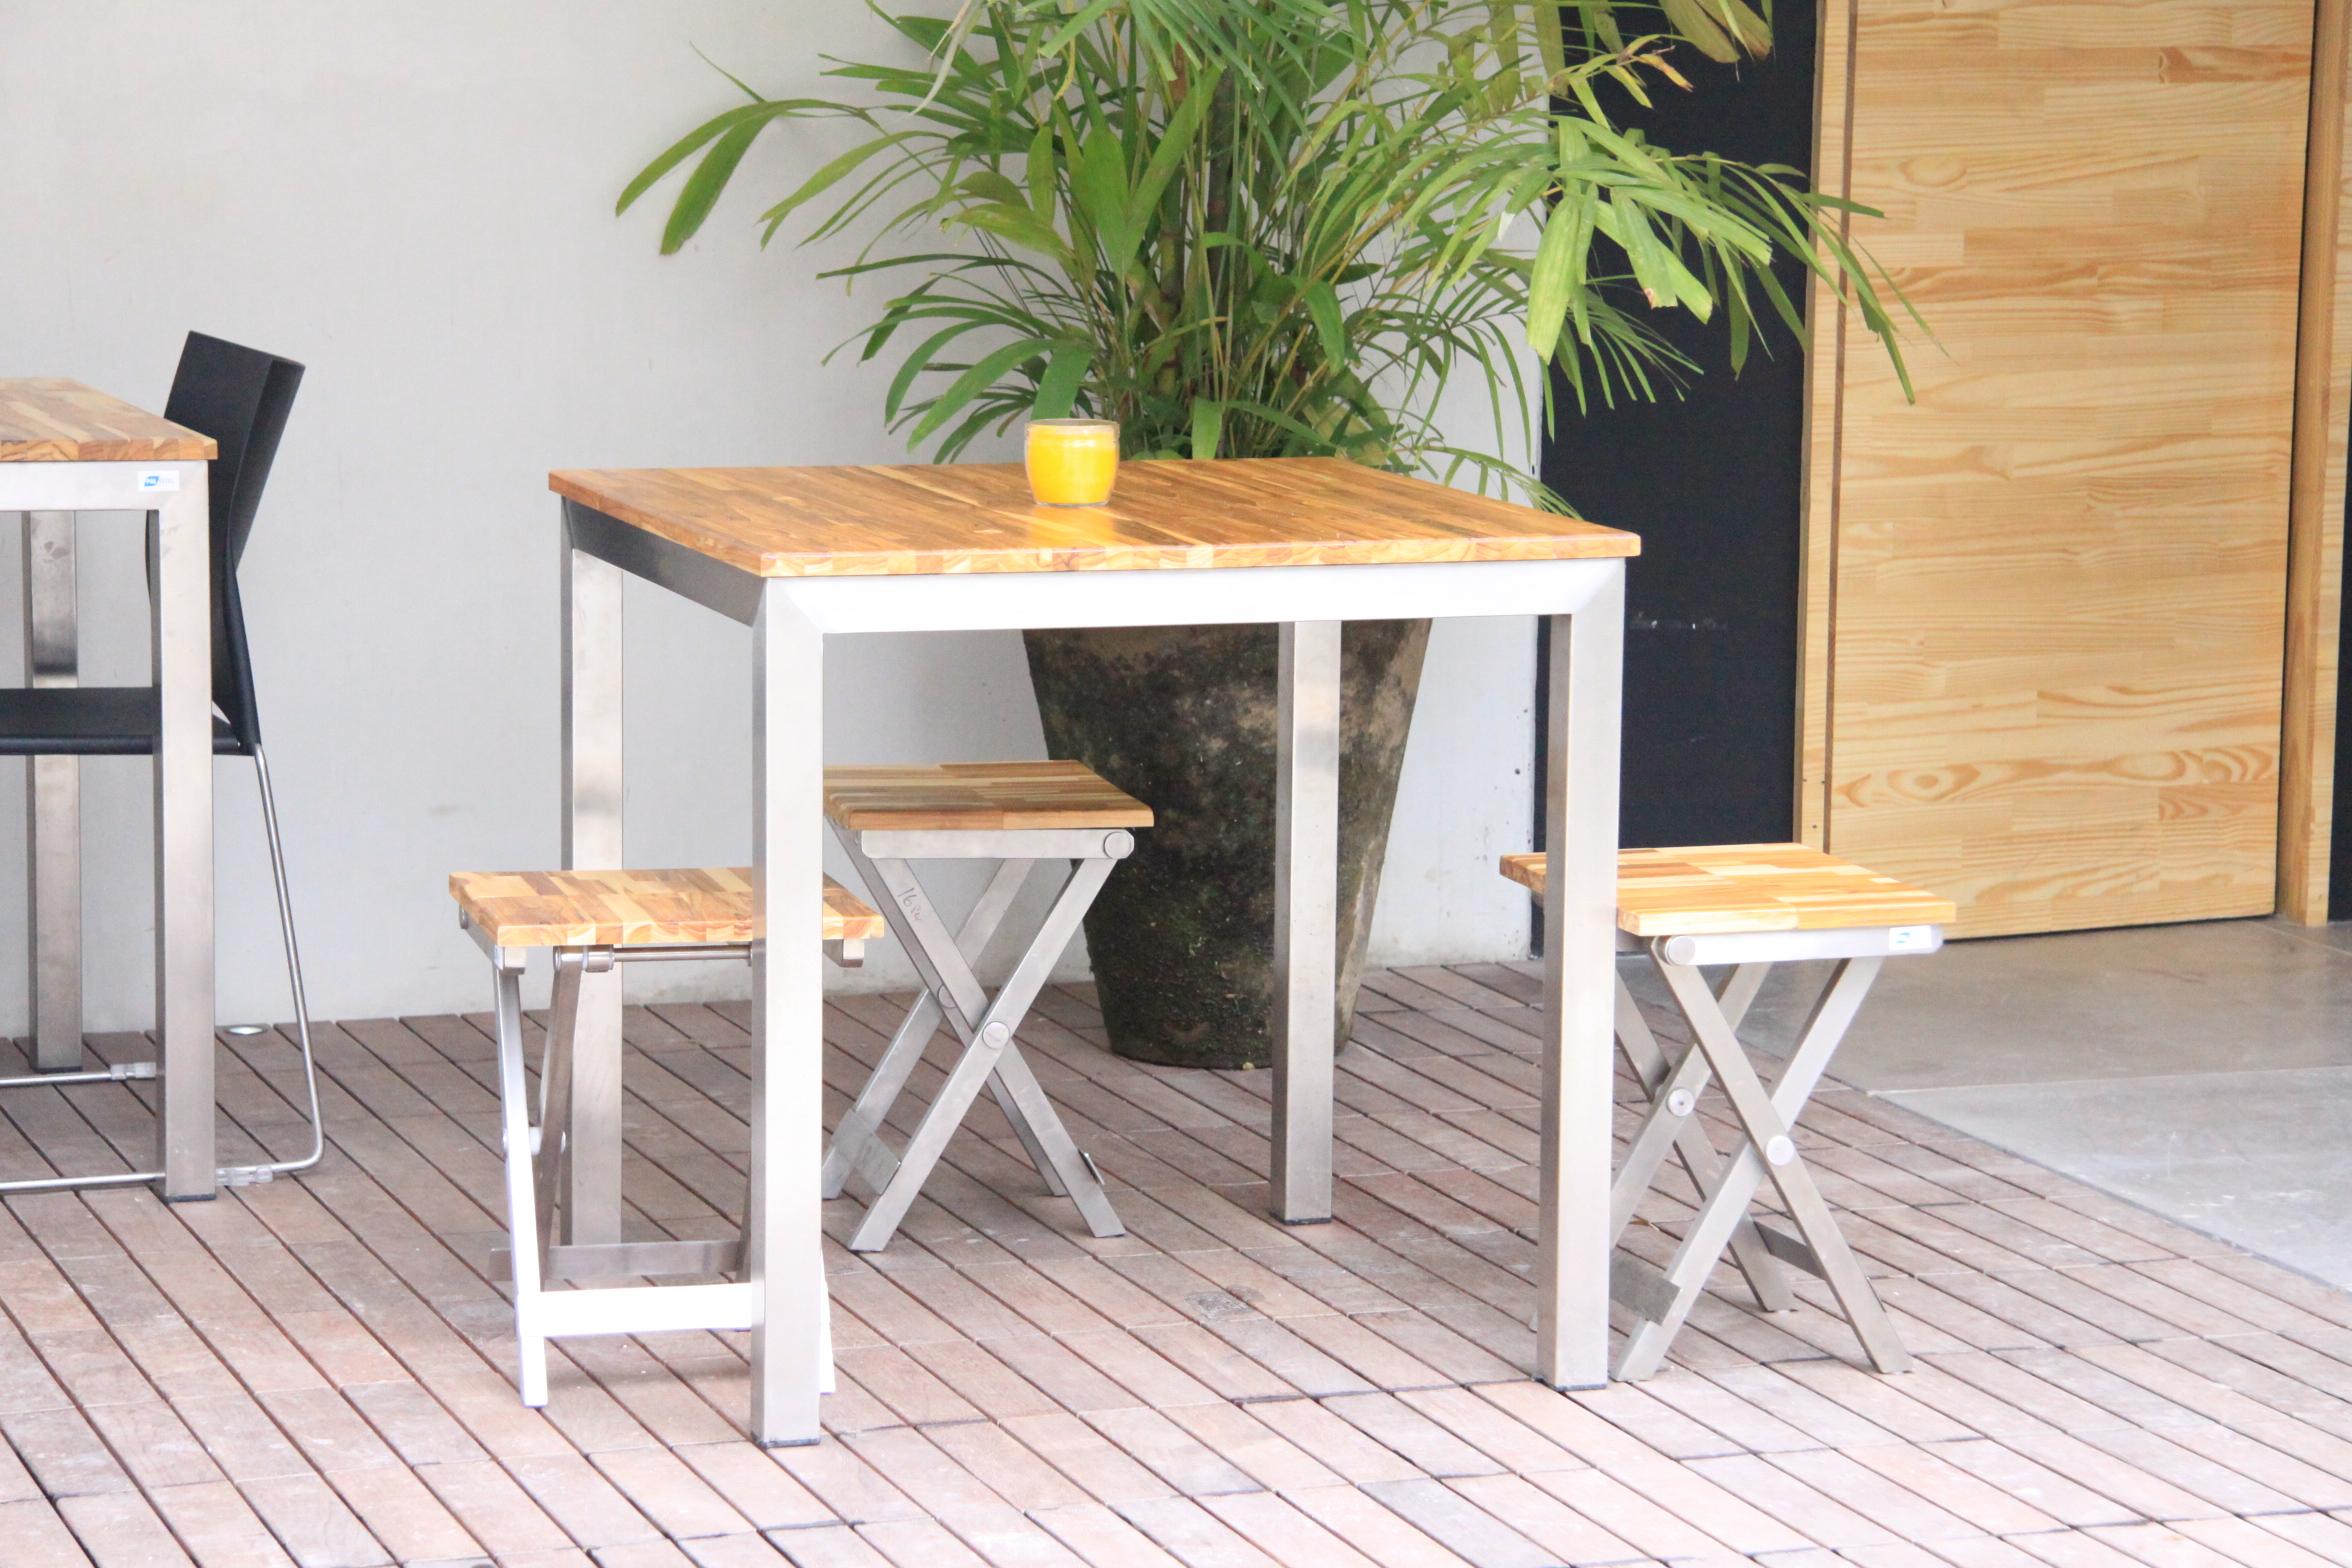 Proteger muebles de madera del jardín 4